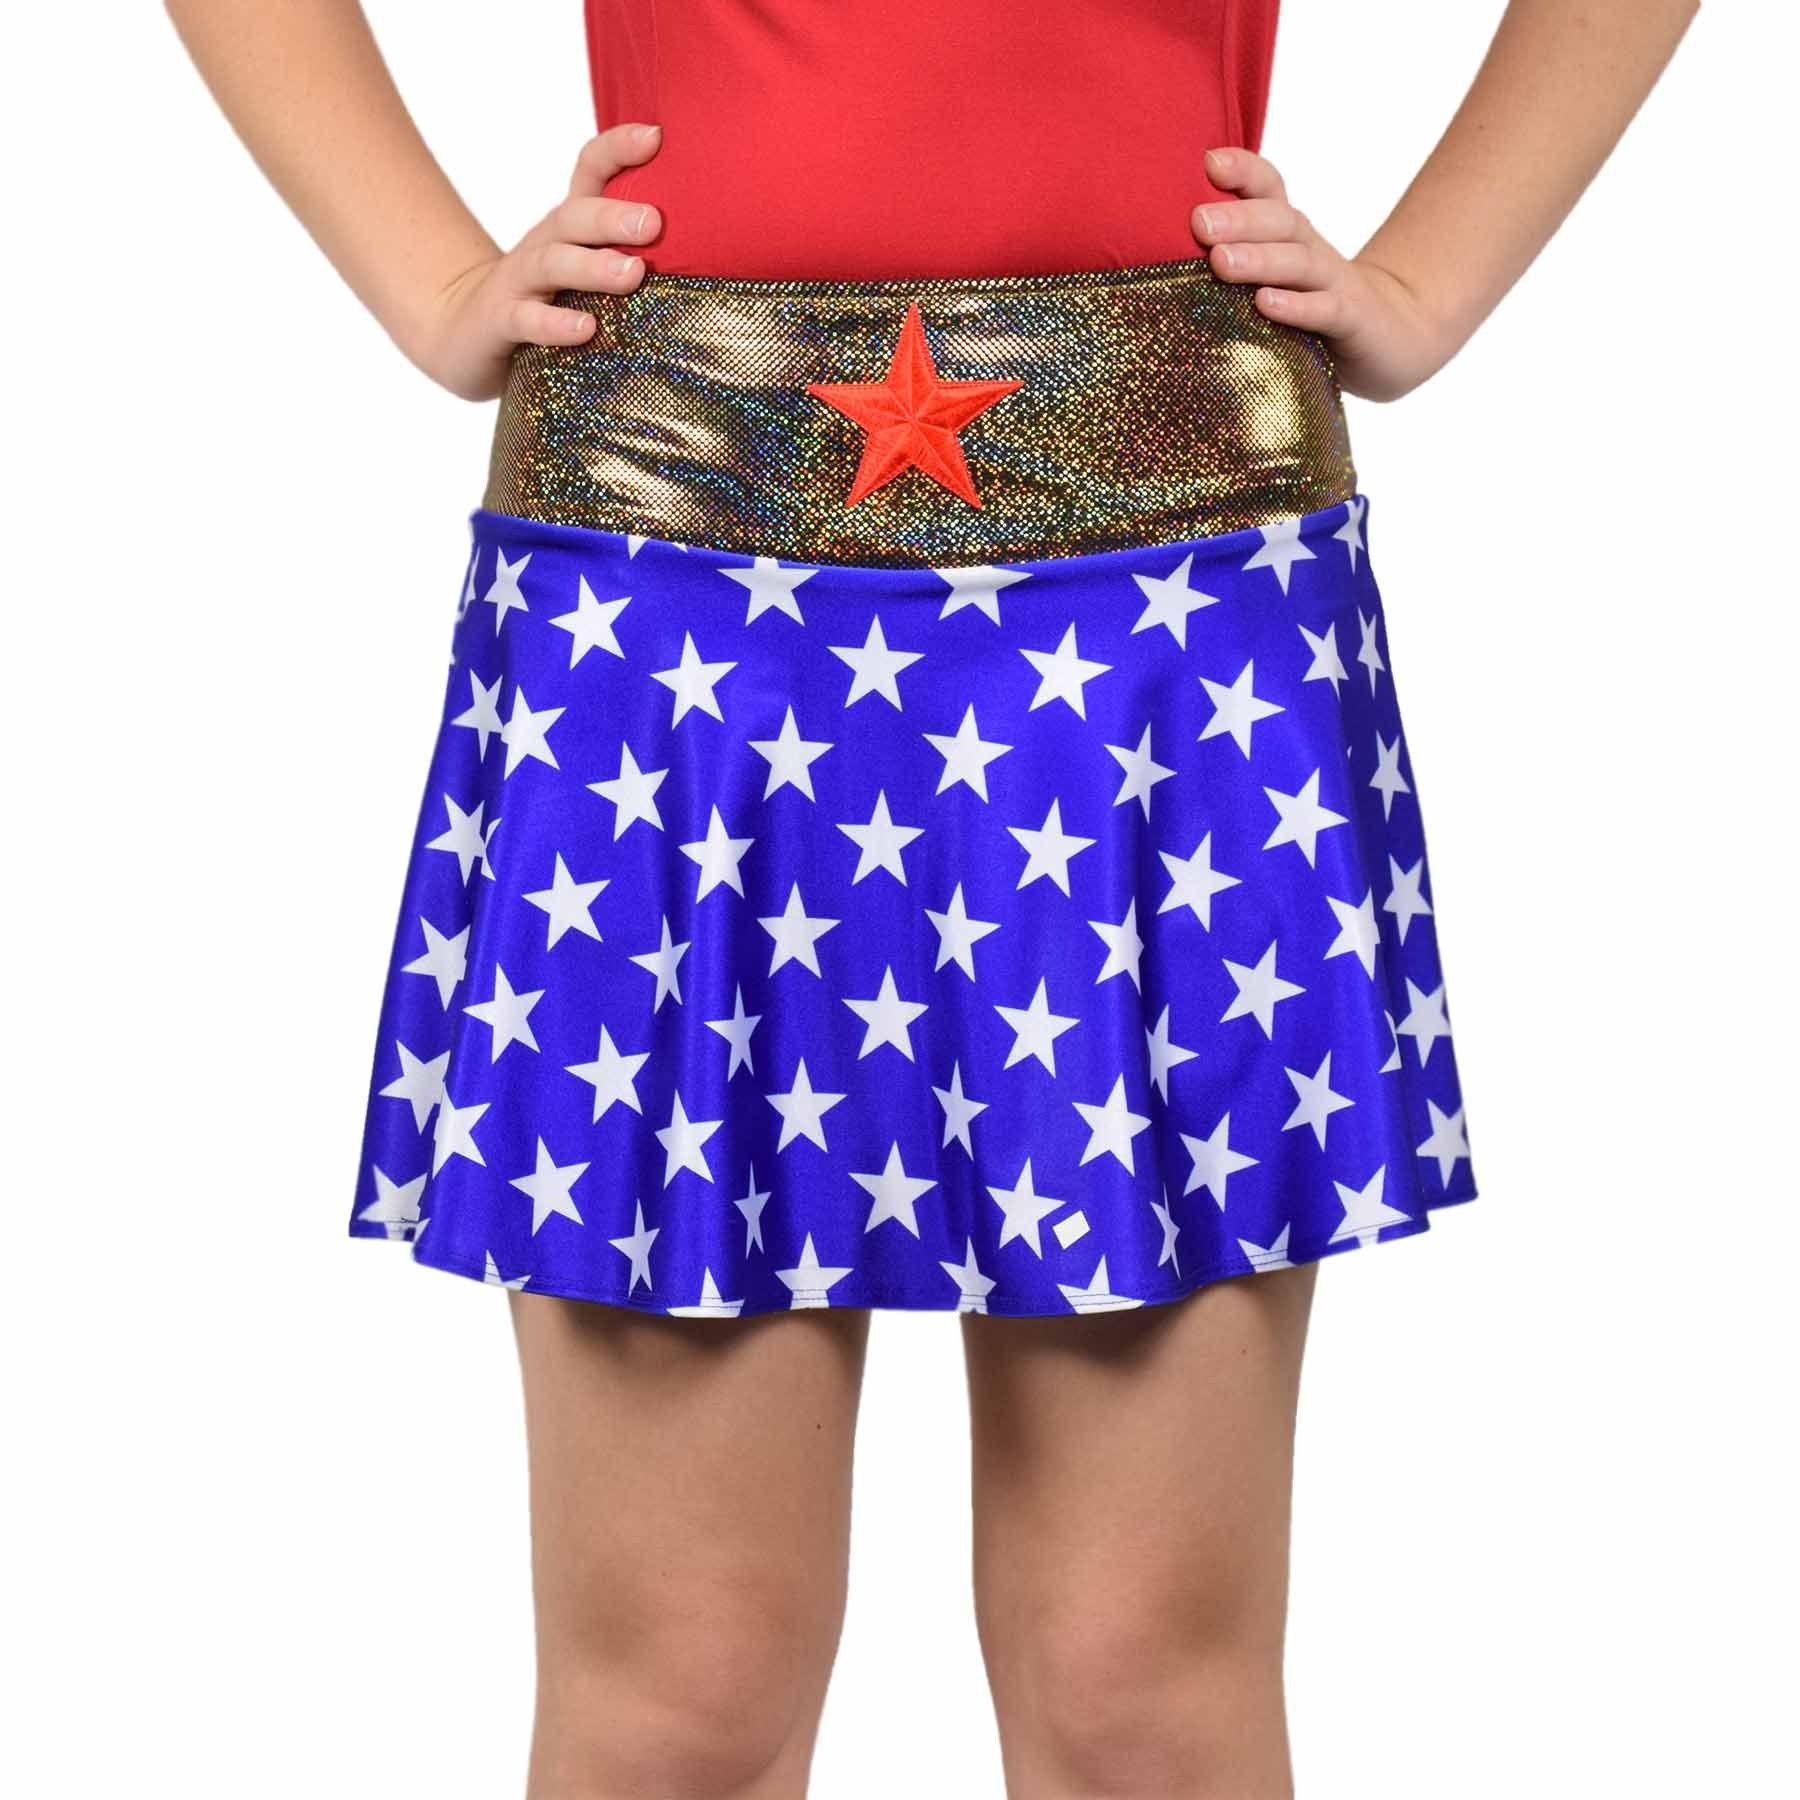 WomanOfSteel SwingStyle 2.1 Running skirts, Running